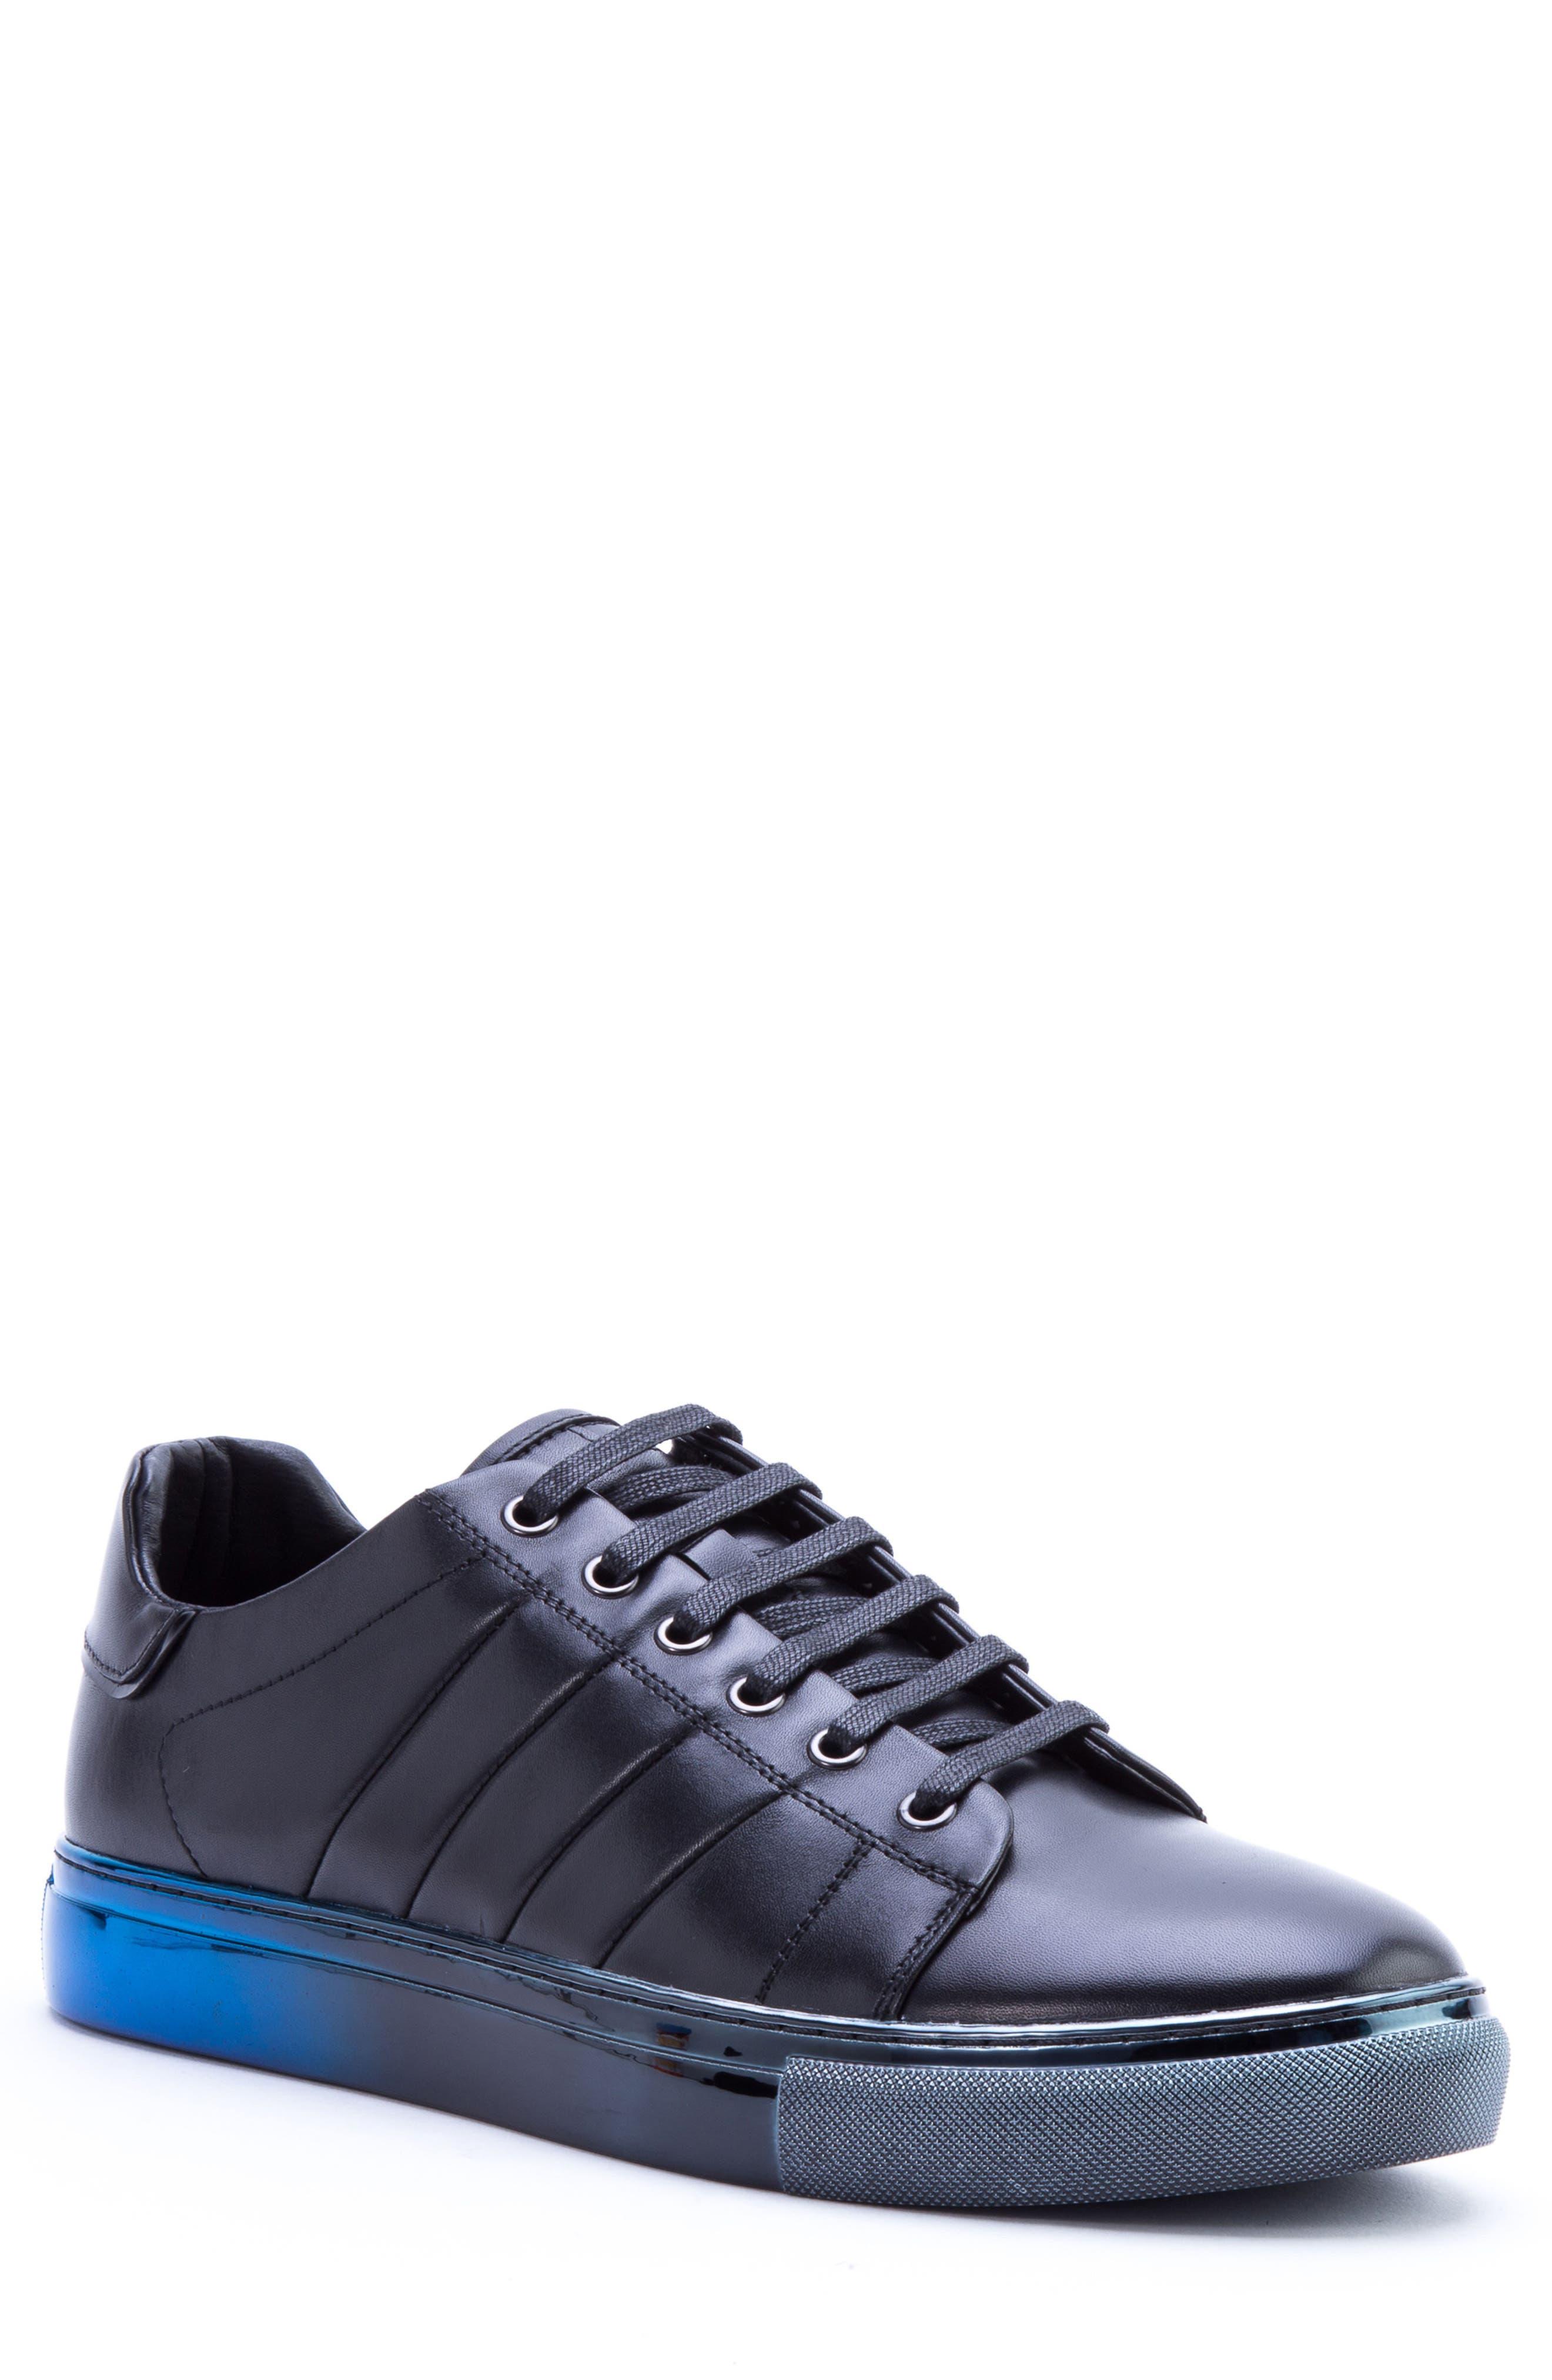 Brando Sneaker,                             Main thumbnail 1, color,                             BLACK LEATHER